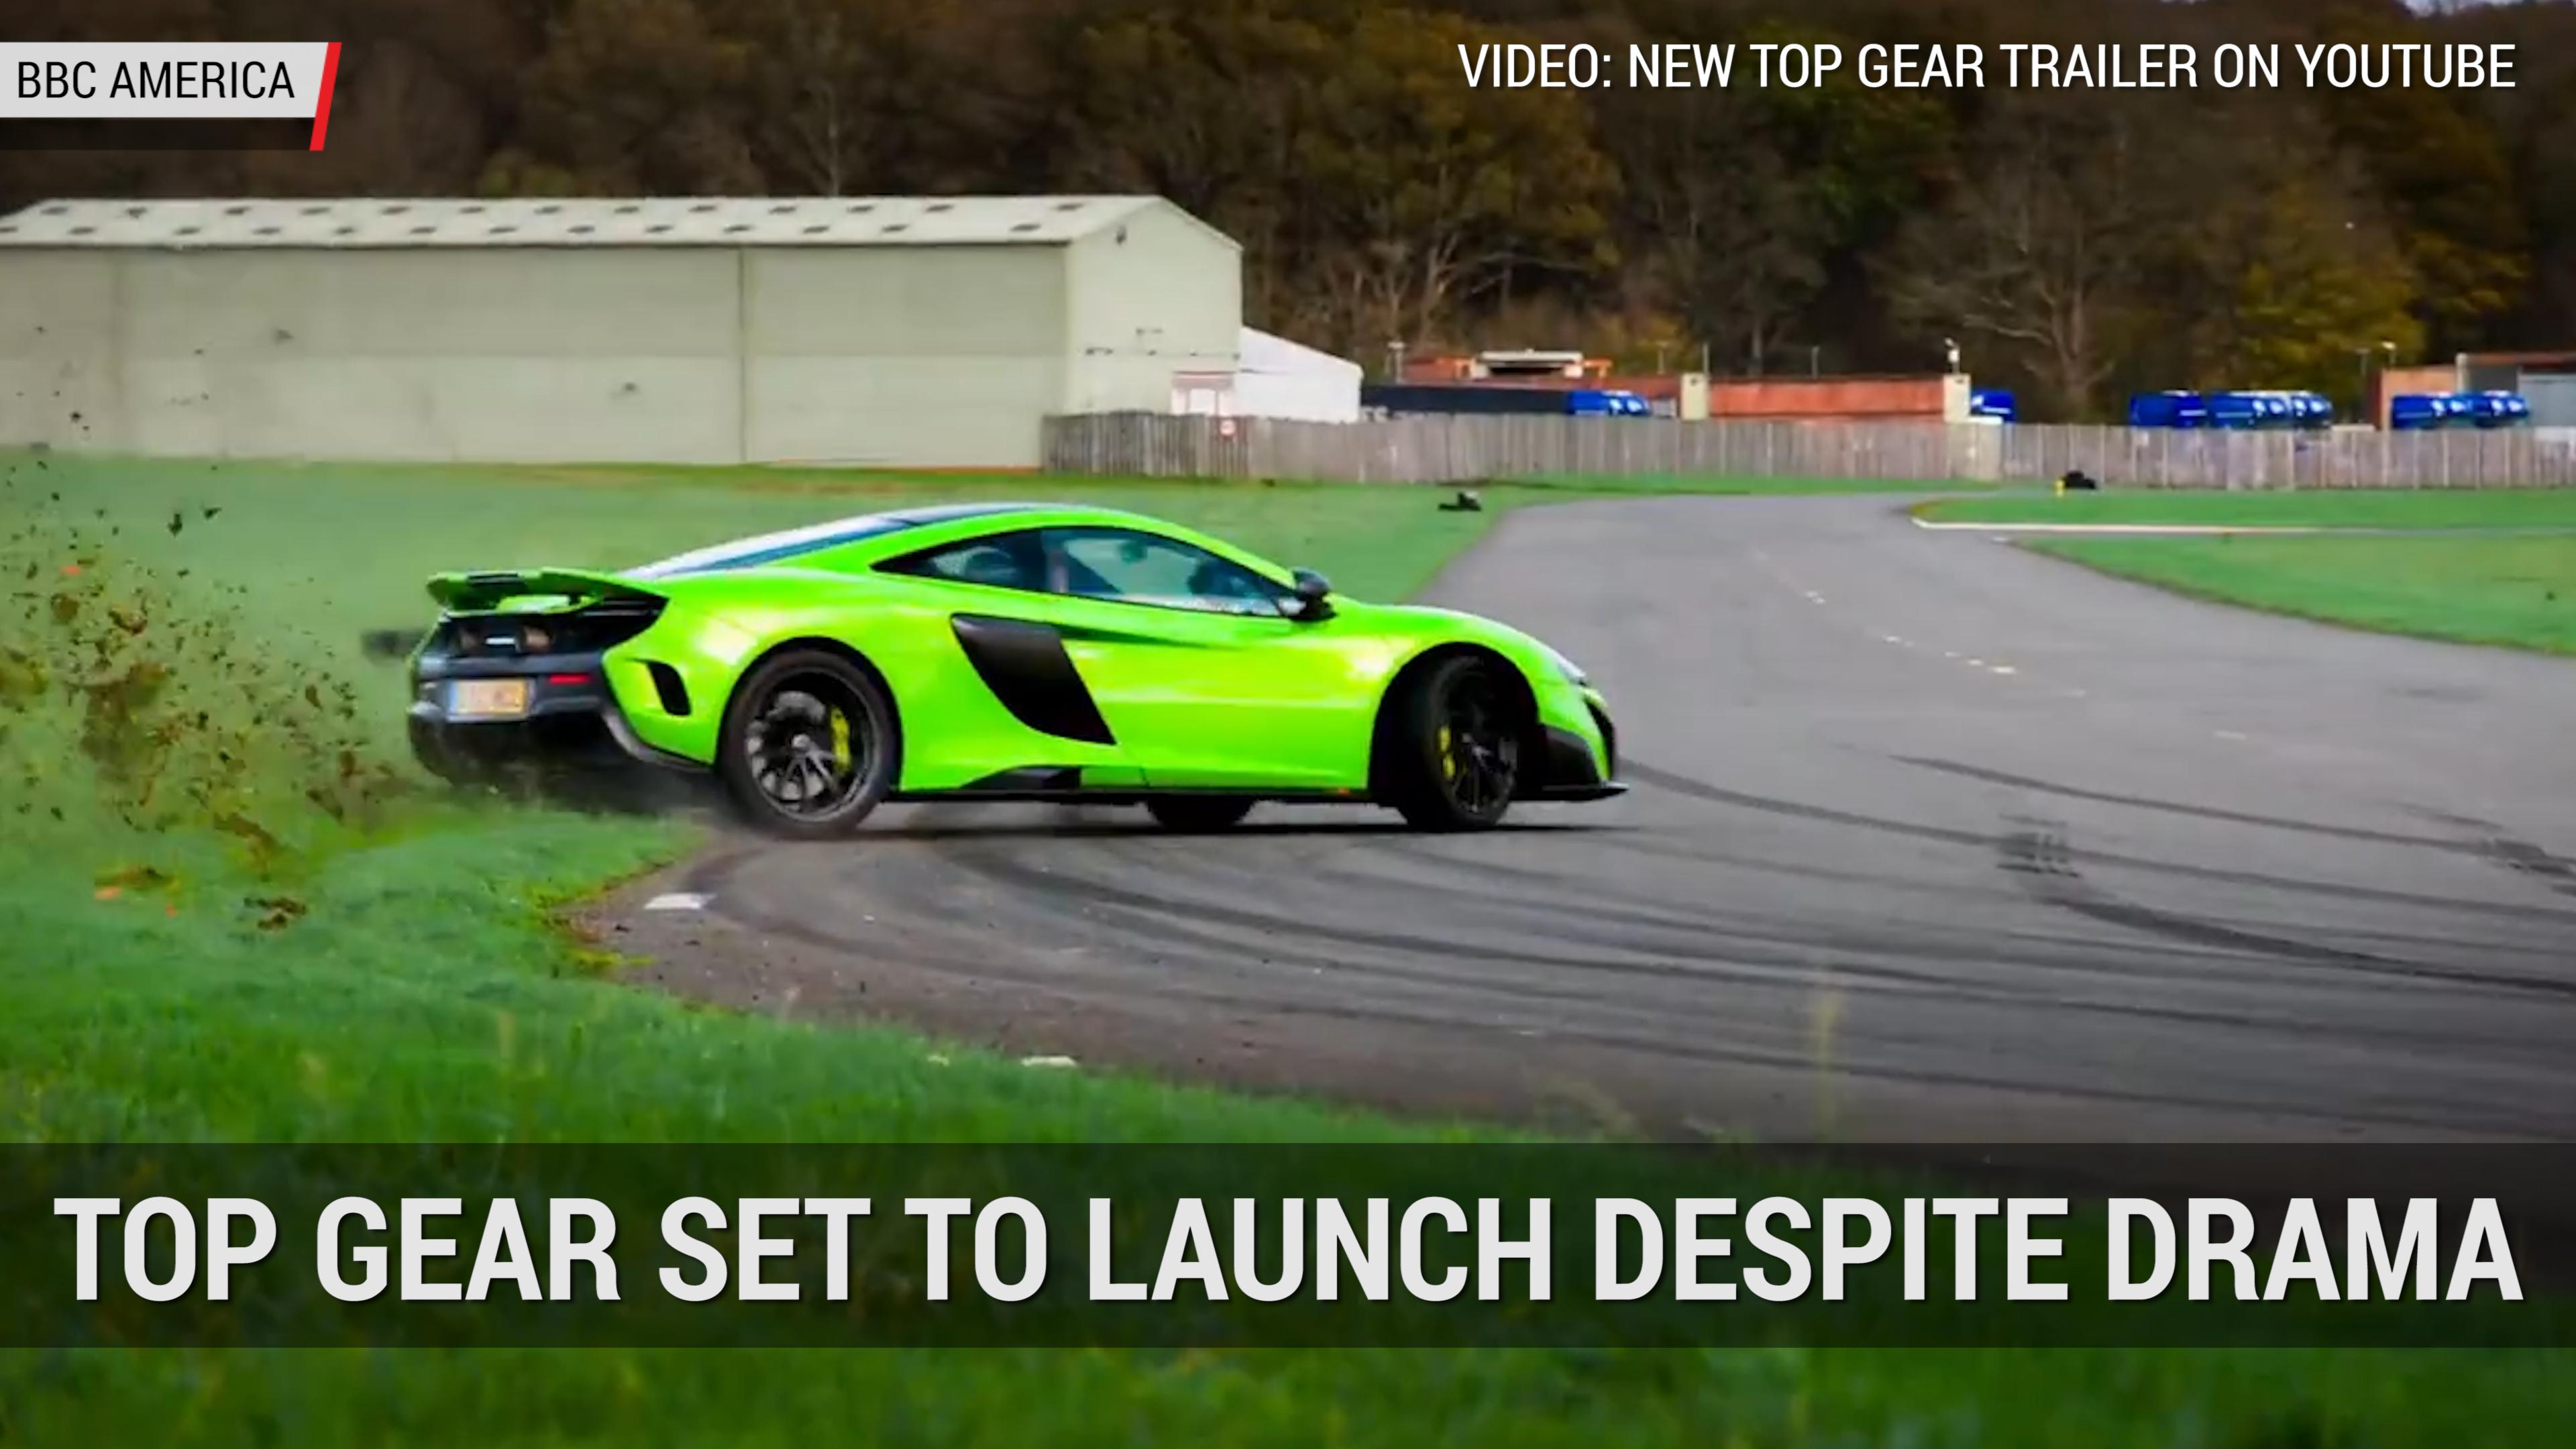 Top Gear S Latest Trailer Shows Off A Golden Bugatti Chiron Autoblog